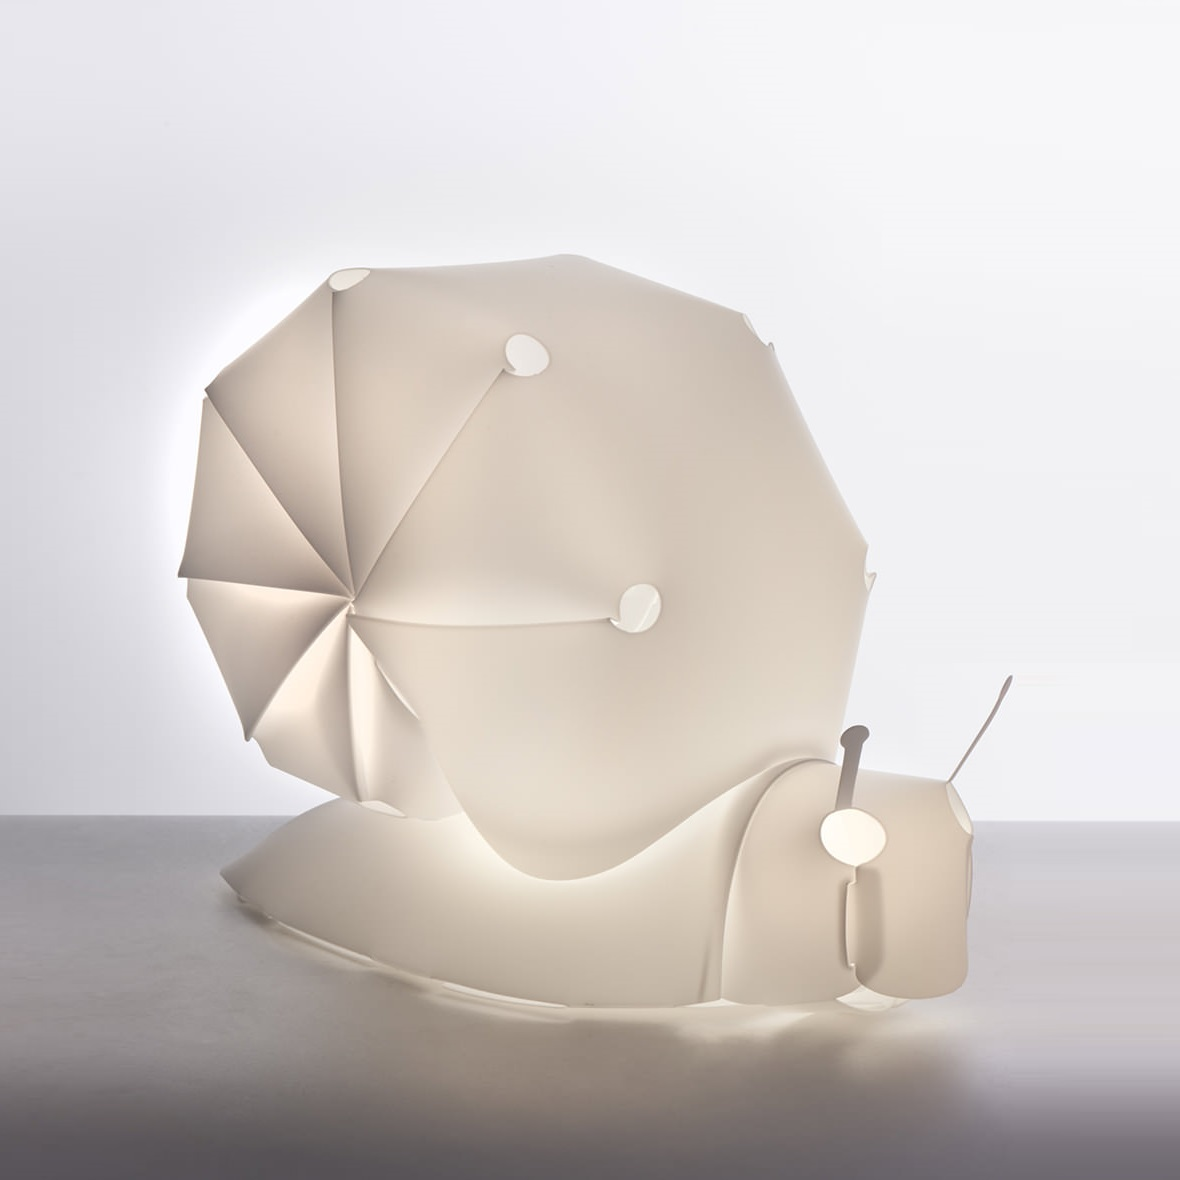 Candeeiro de mesa com luz de presença ZzzooLigth Table Lamp with night light